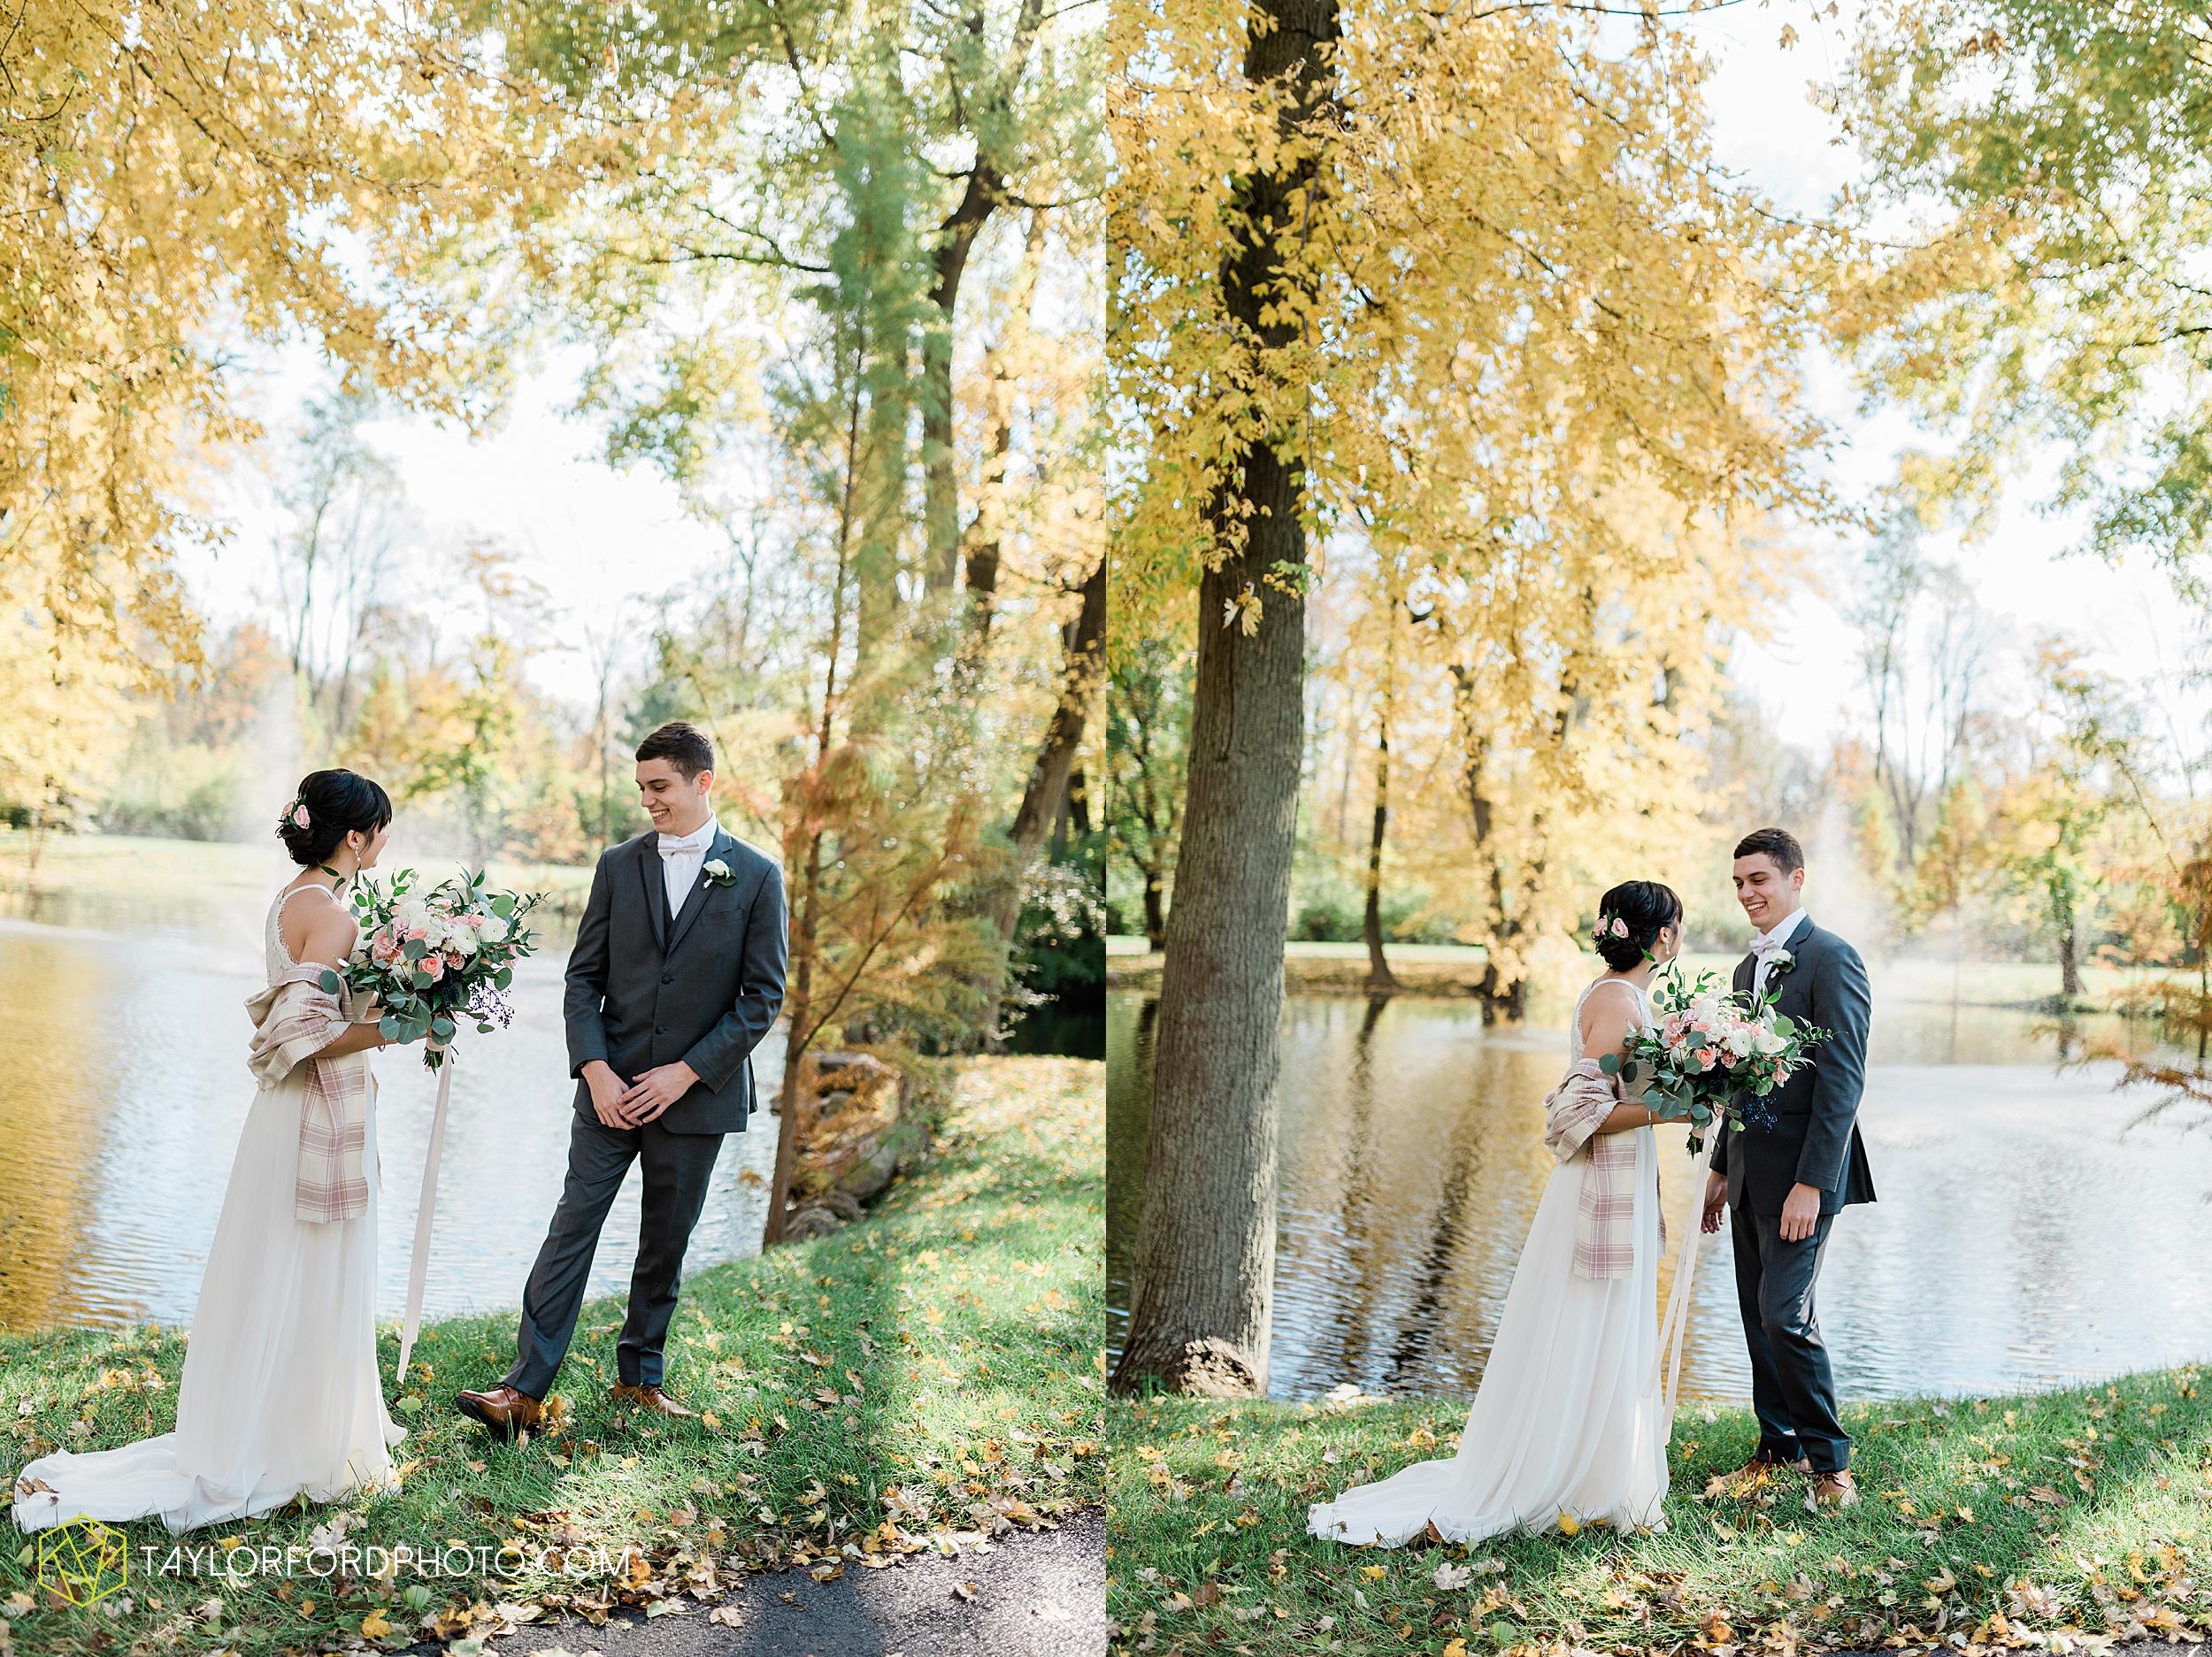 marissa-nicole-nick-daeger-orrmont-estate-farm-wedding-piqua-dayton-troy-ohio-fall-photographer-taylor-ford-photography_1507.jpg